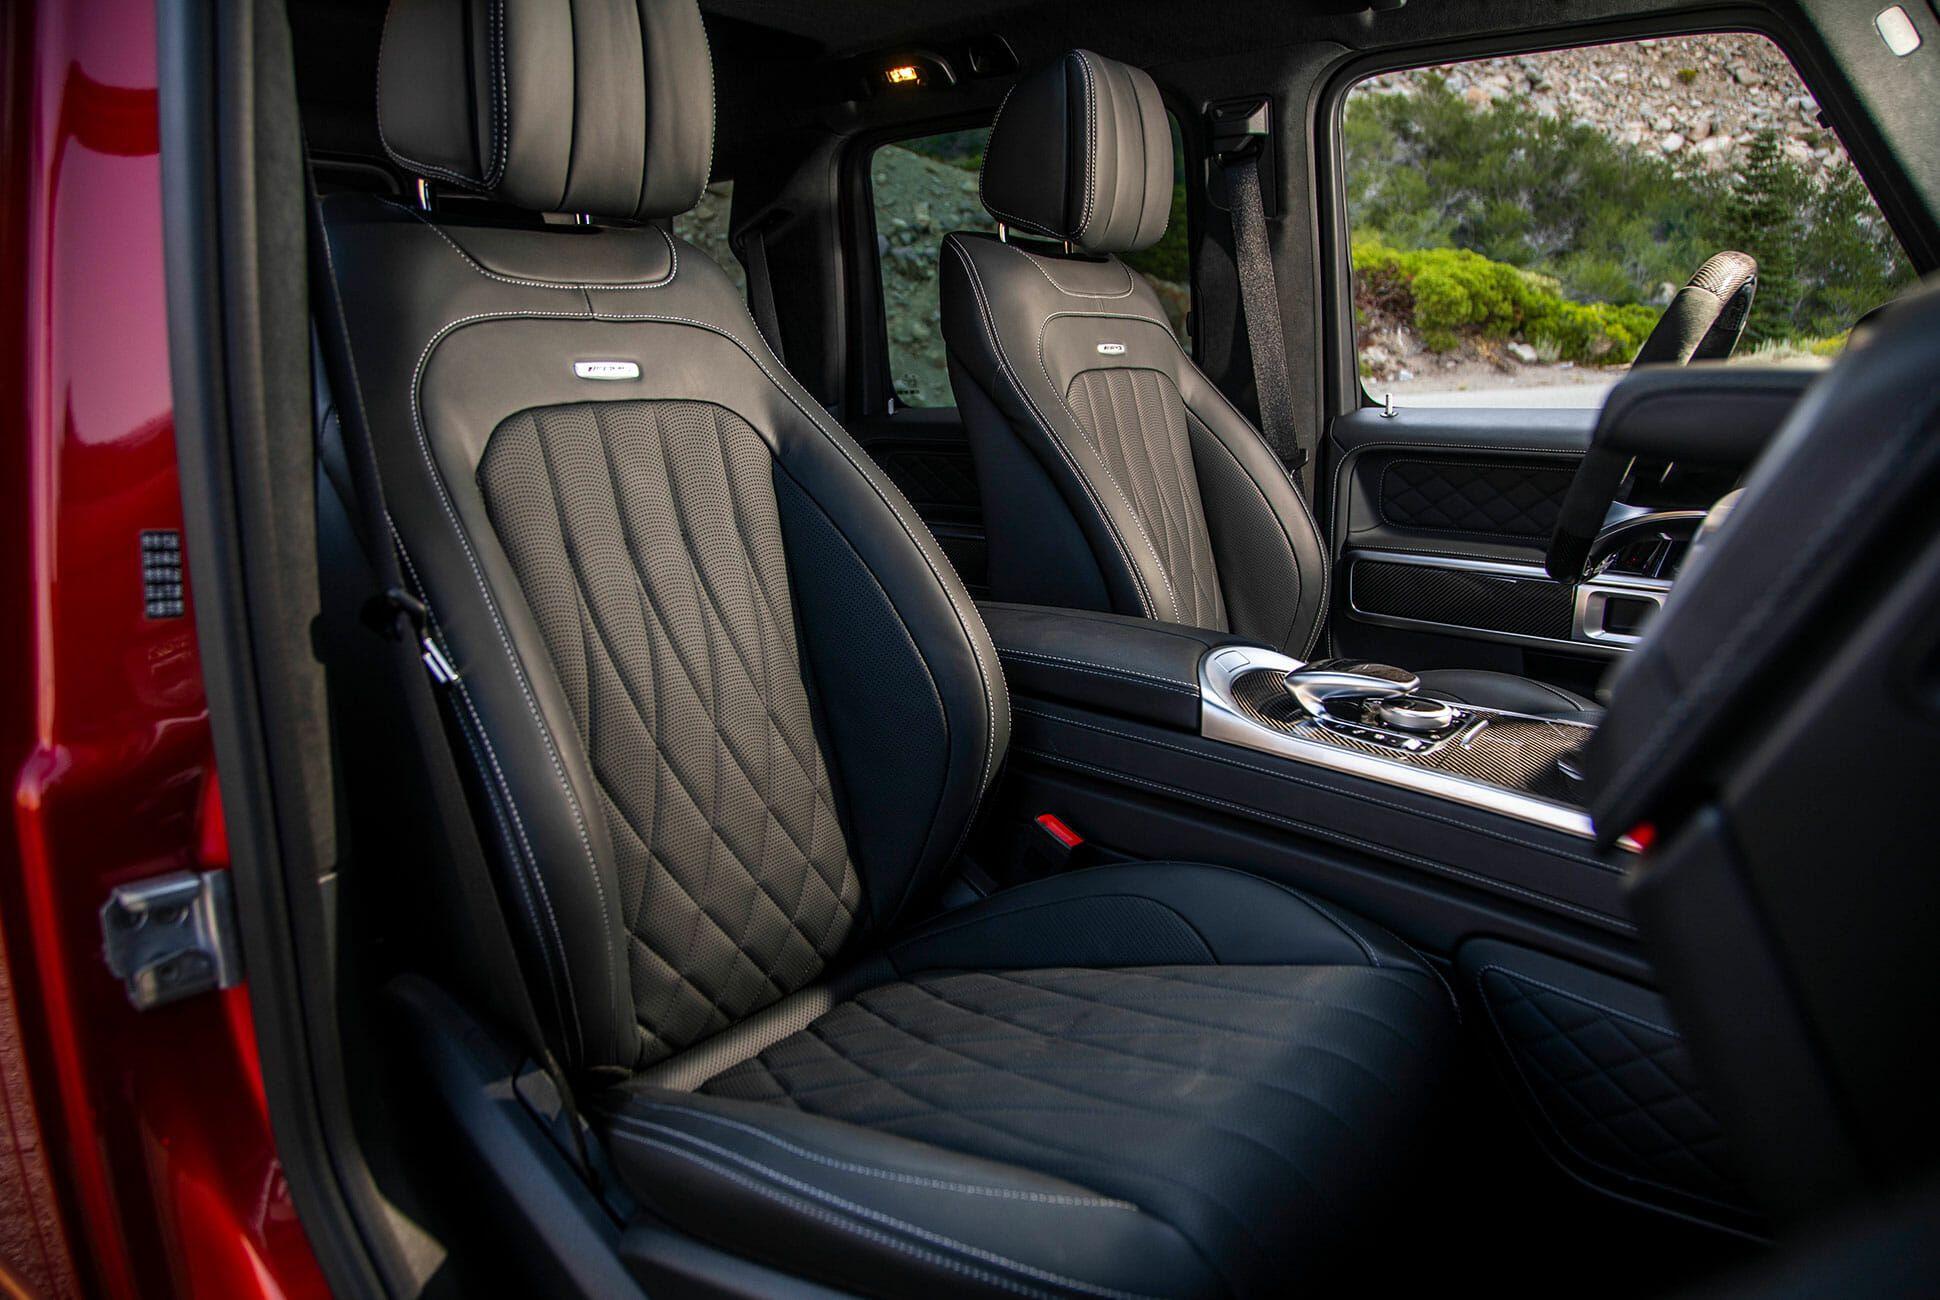 2019-Mercedes-AMG-G63-Review-gear-patrol-slide-5